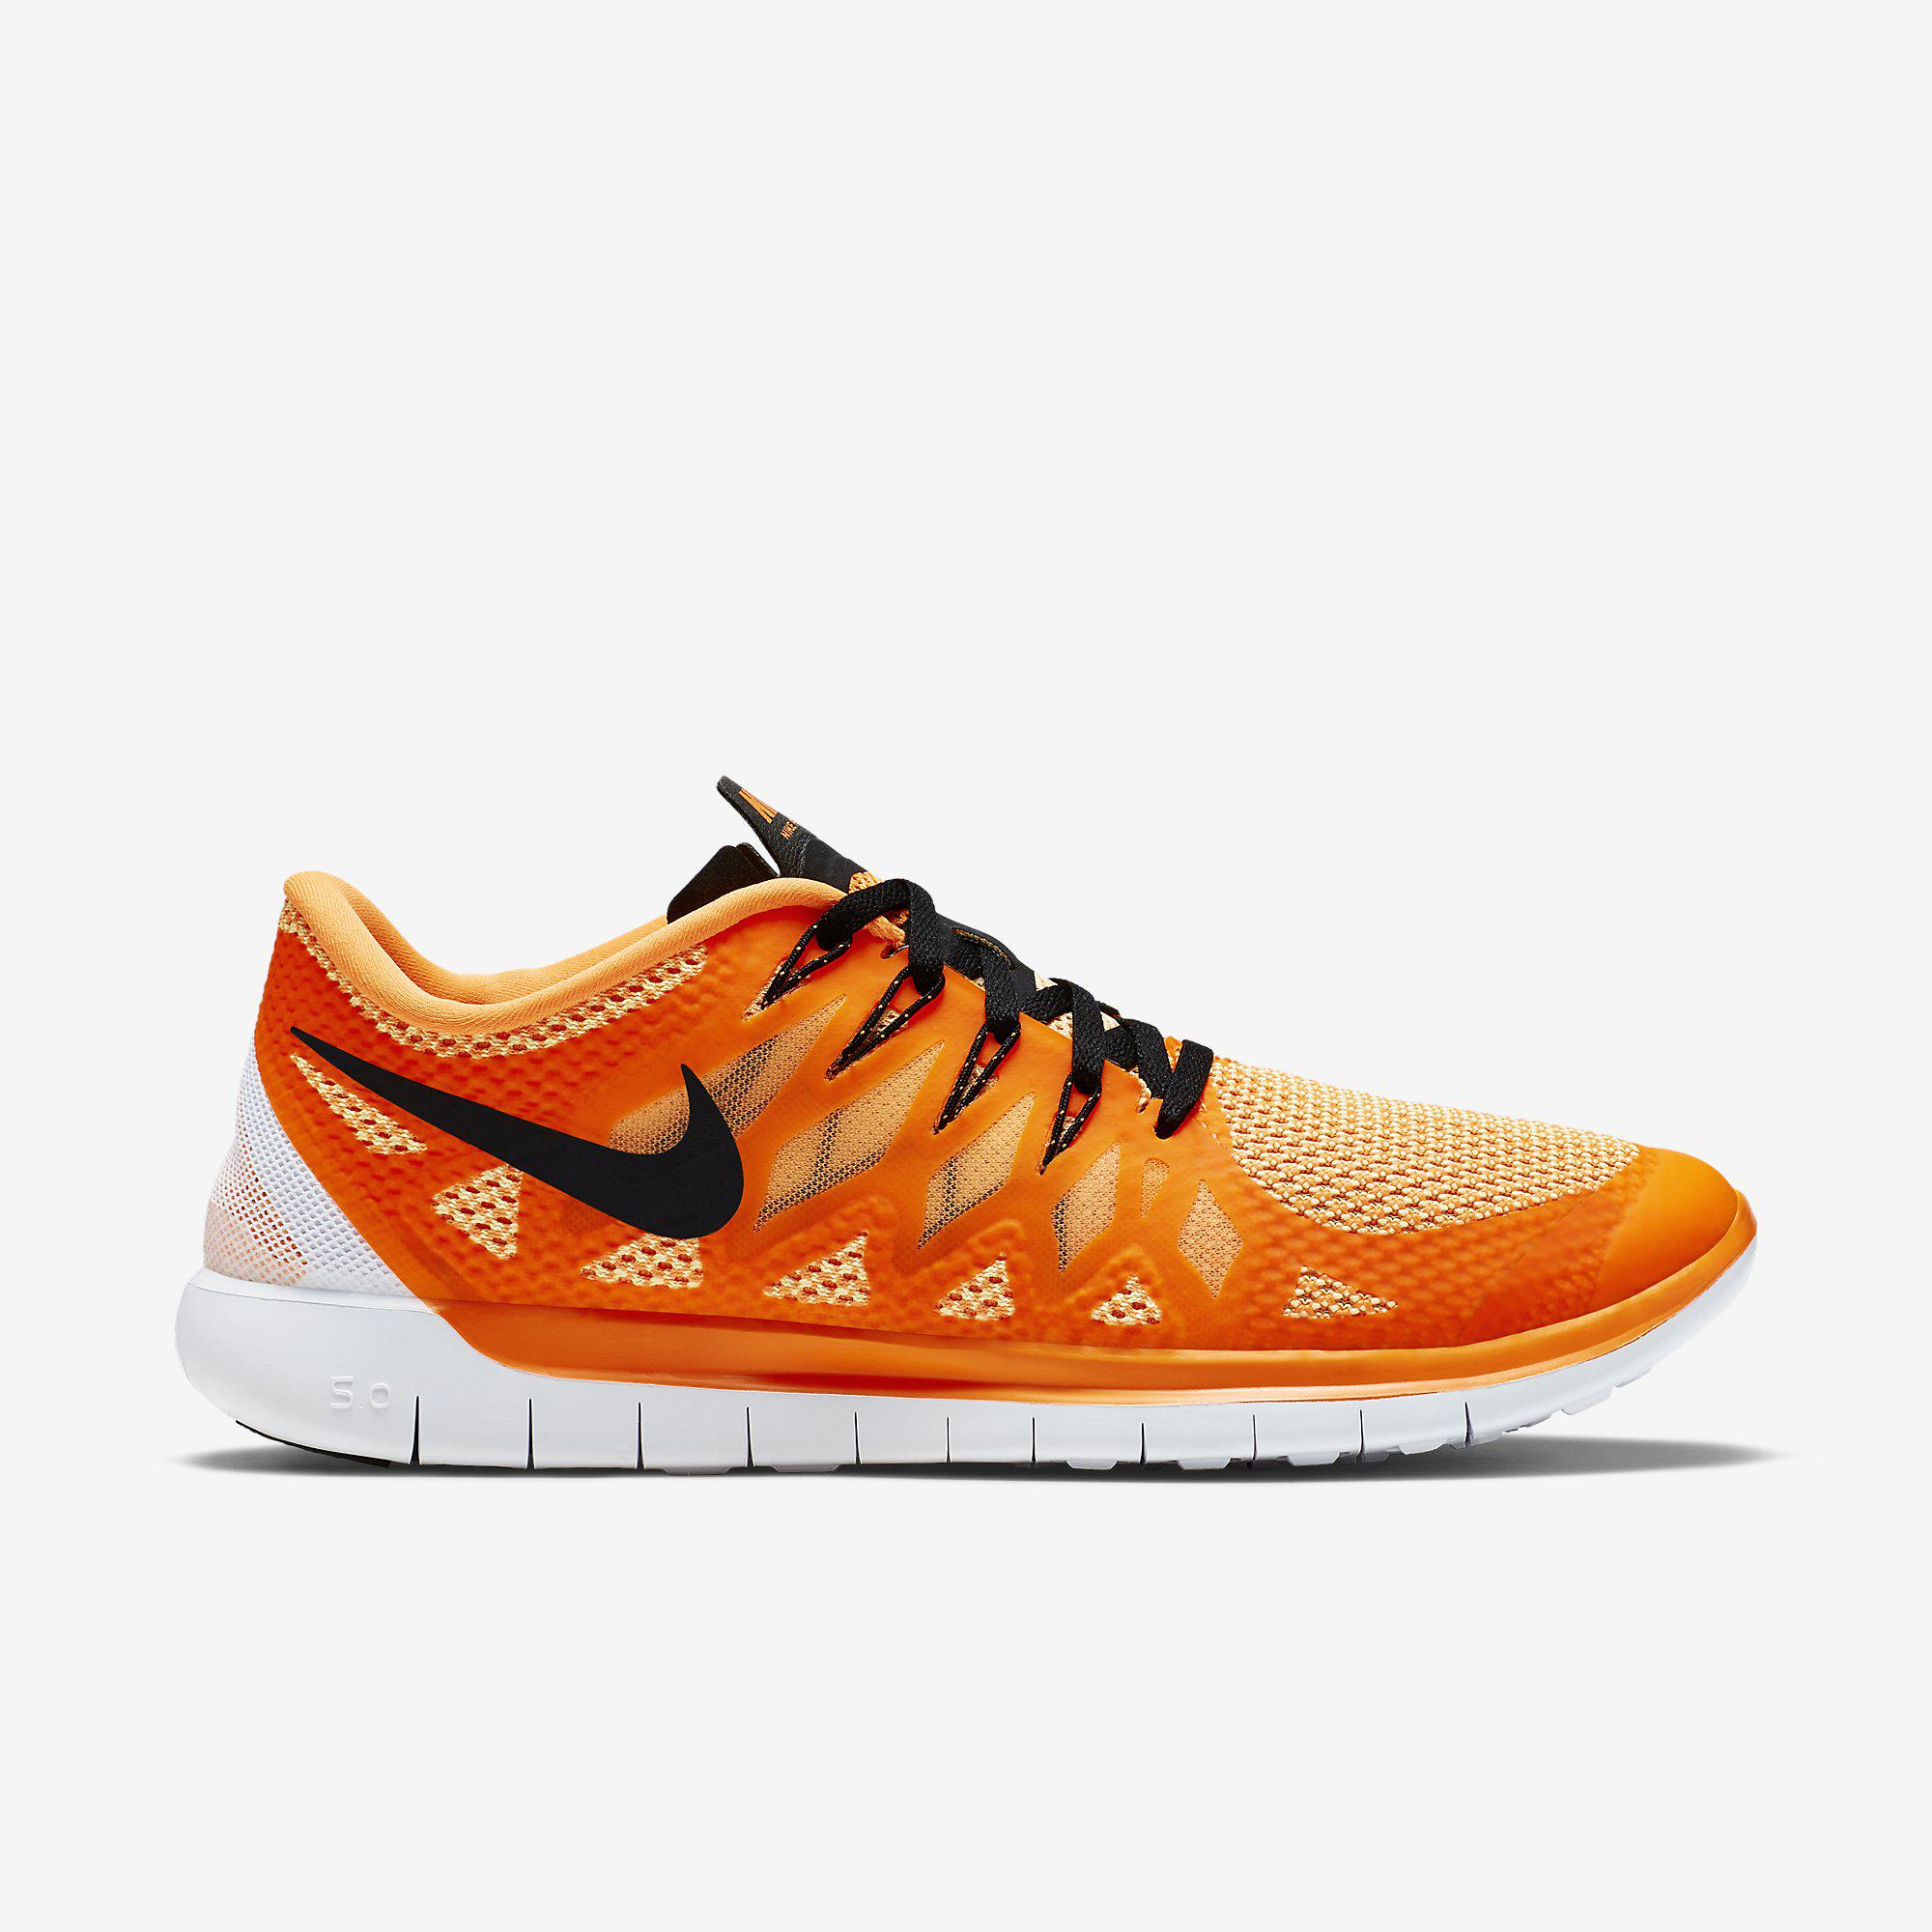 best loved daa8f 3a3fd Nike Mens Free 5.0+ Running Shoes - Orange/Black